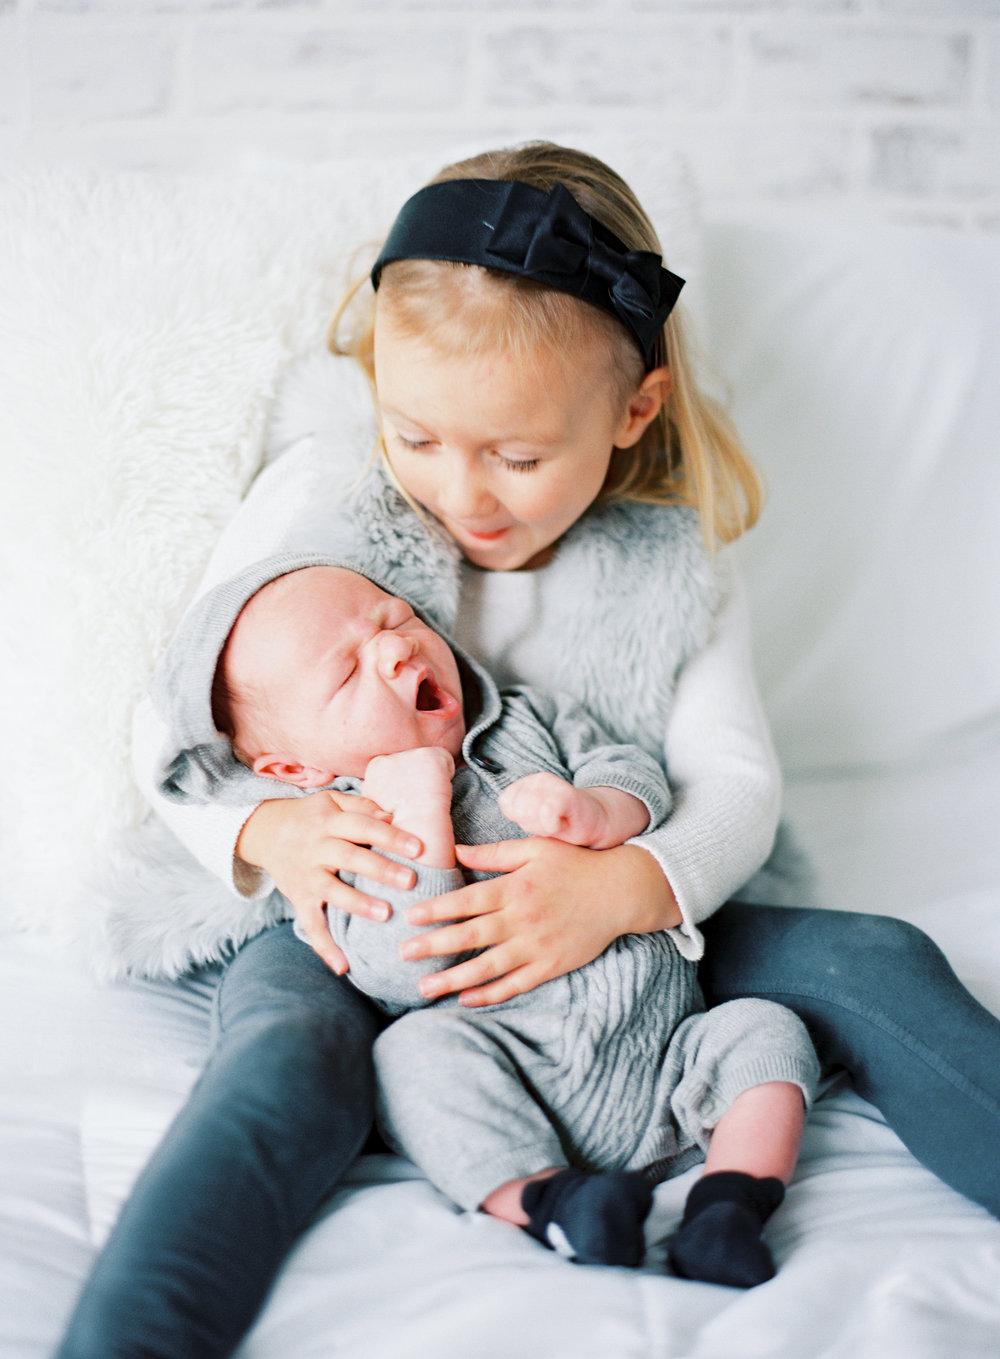 pittsburgh-newborn-family-Steven-Dray-photographer-anna-laero-photography-2.jpg